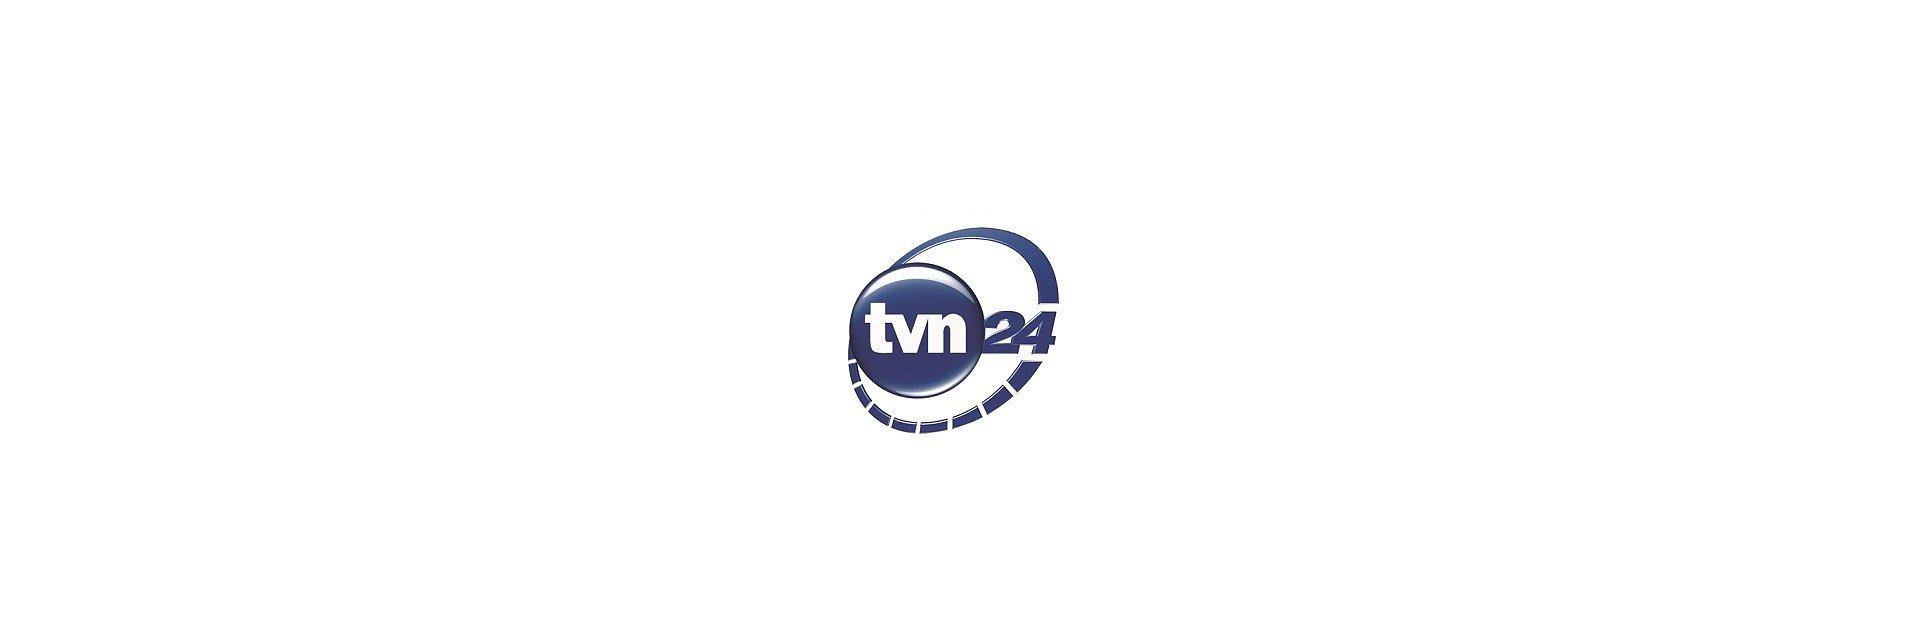 Ruszyła druga odsłona kampanii TVN24